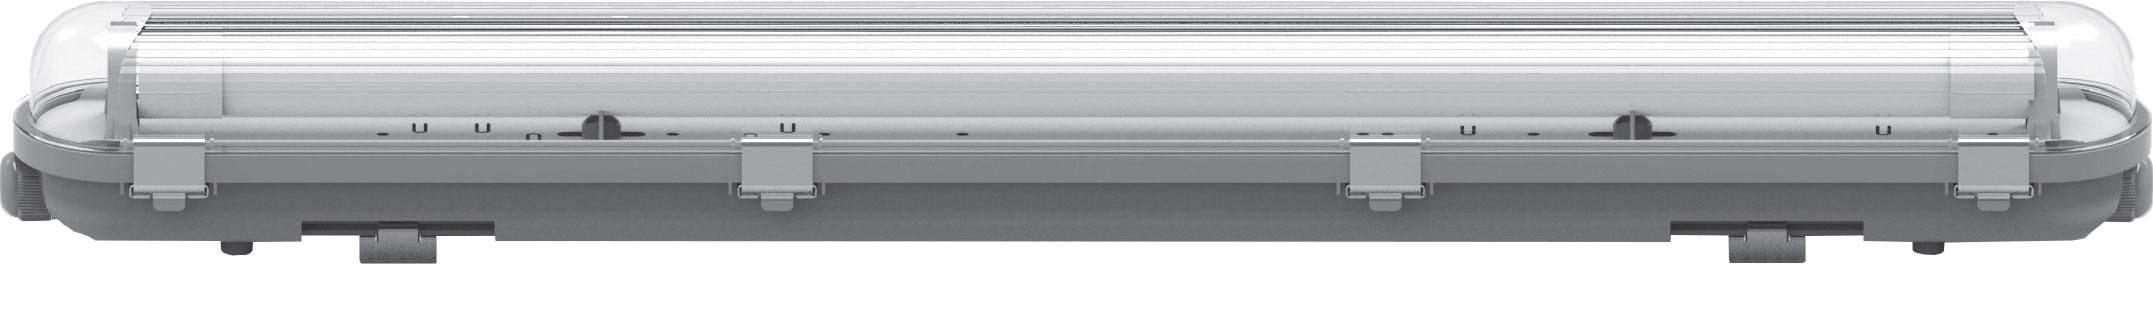 MILANO X LED DOPPIO TUBO POLICARBONATO 1500MM (2X58) IMPERIA